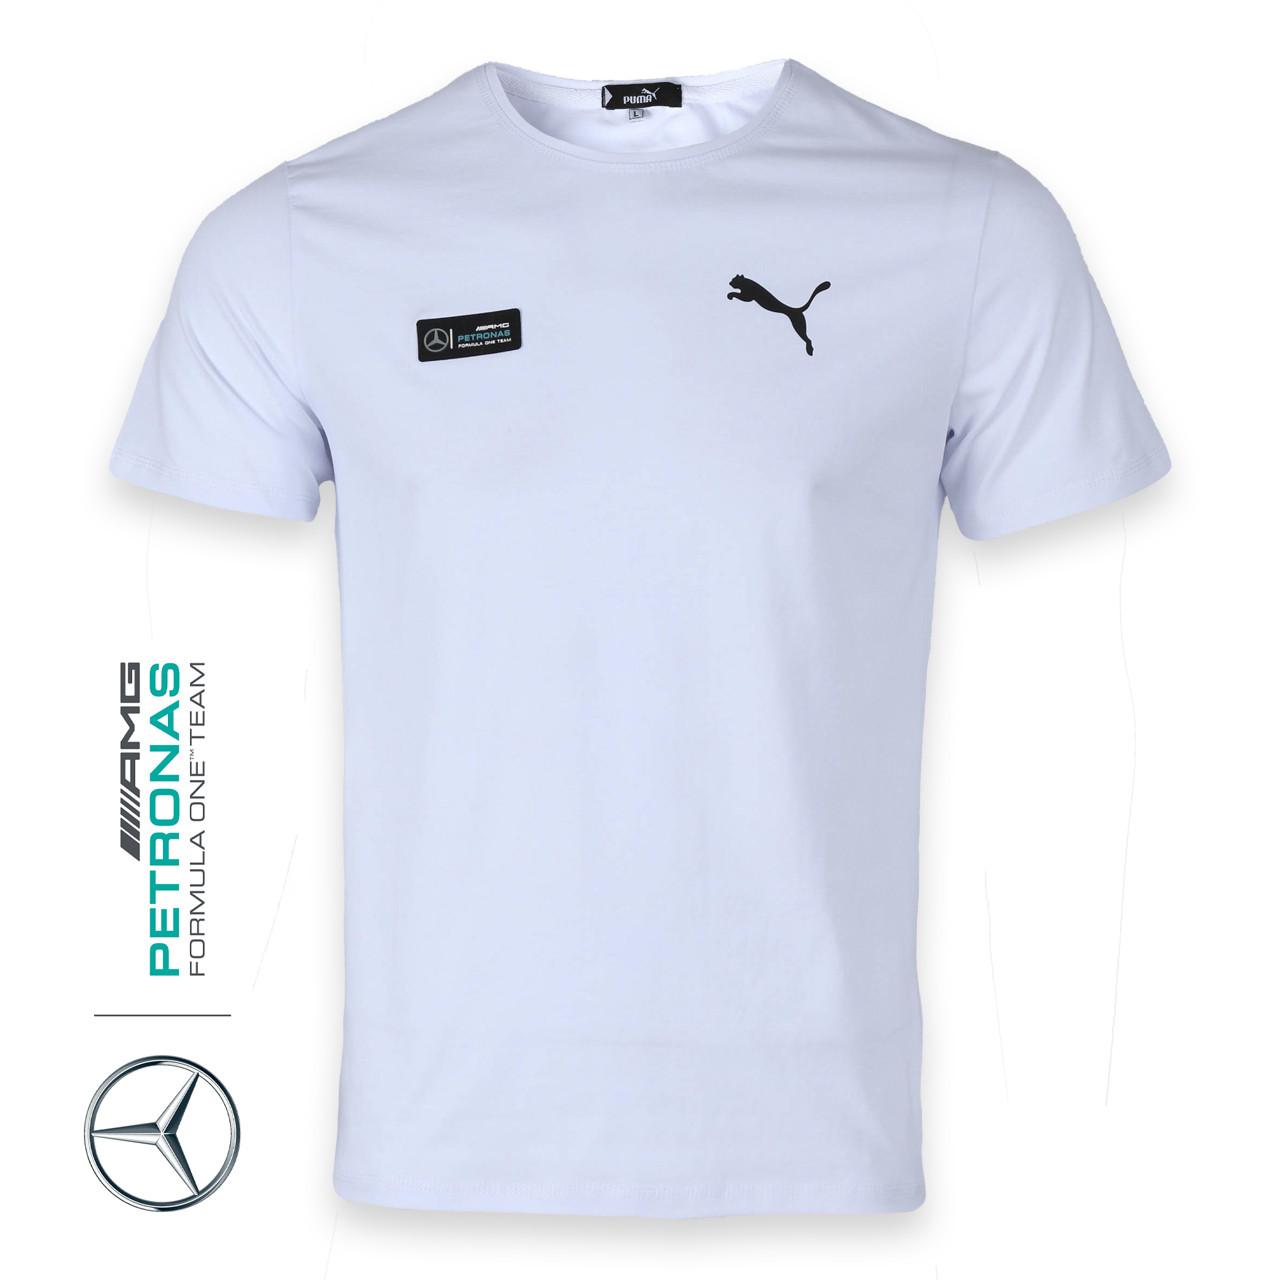 Футболка спортивная белый PUMA - Mercedes Ф-10 WHT XXL(Р) 20-916-020